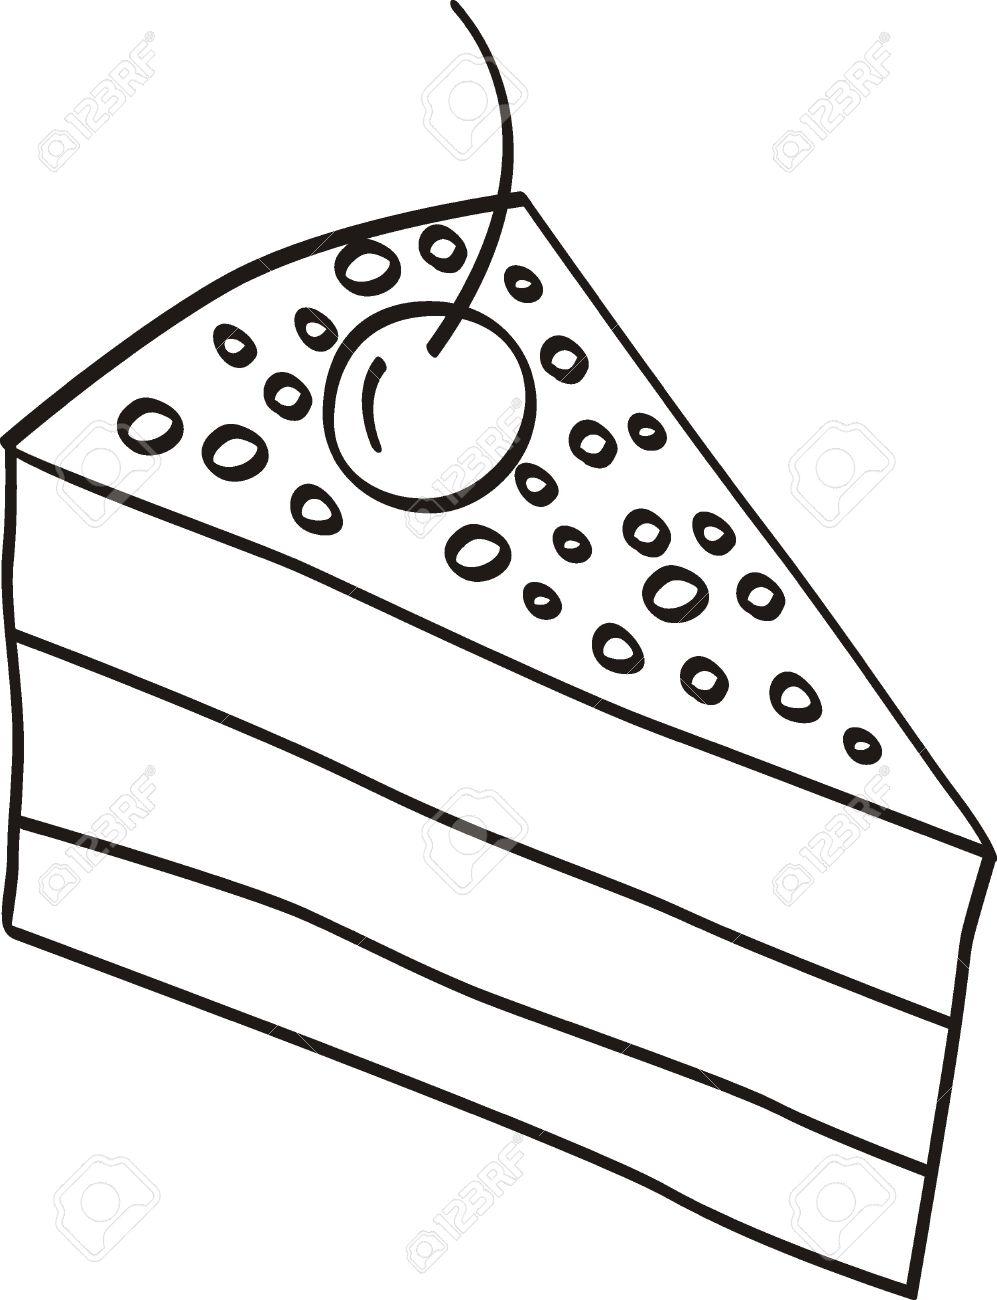 Slice of cake black and white clipart clip art transparent Slice of cake clipart black and white 4 » Clipart Station clip art transparent